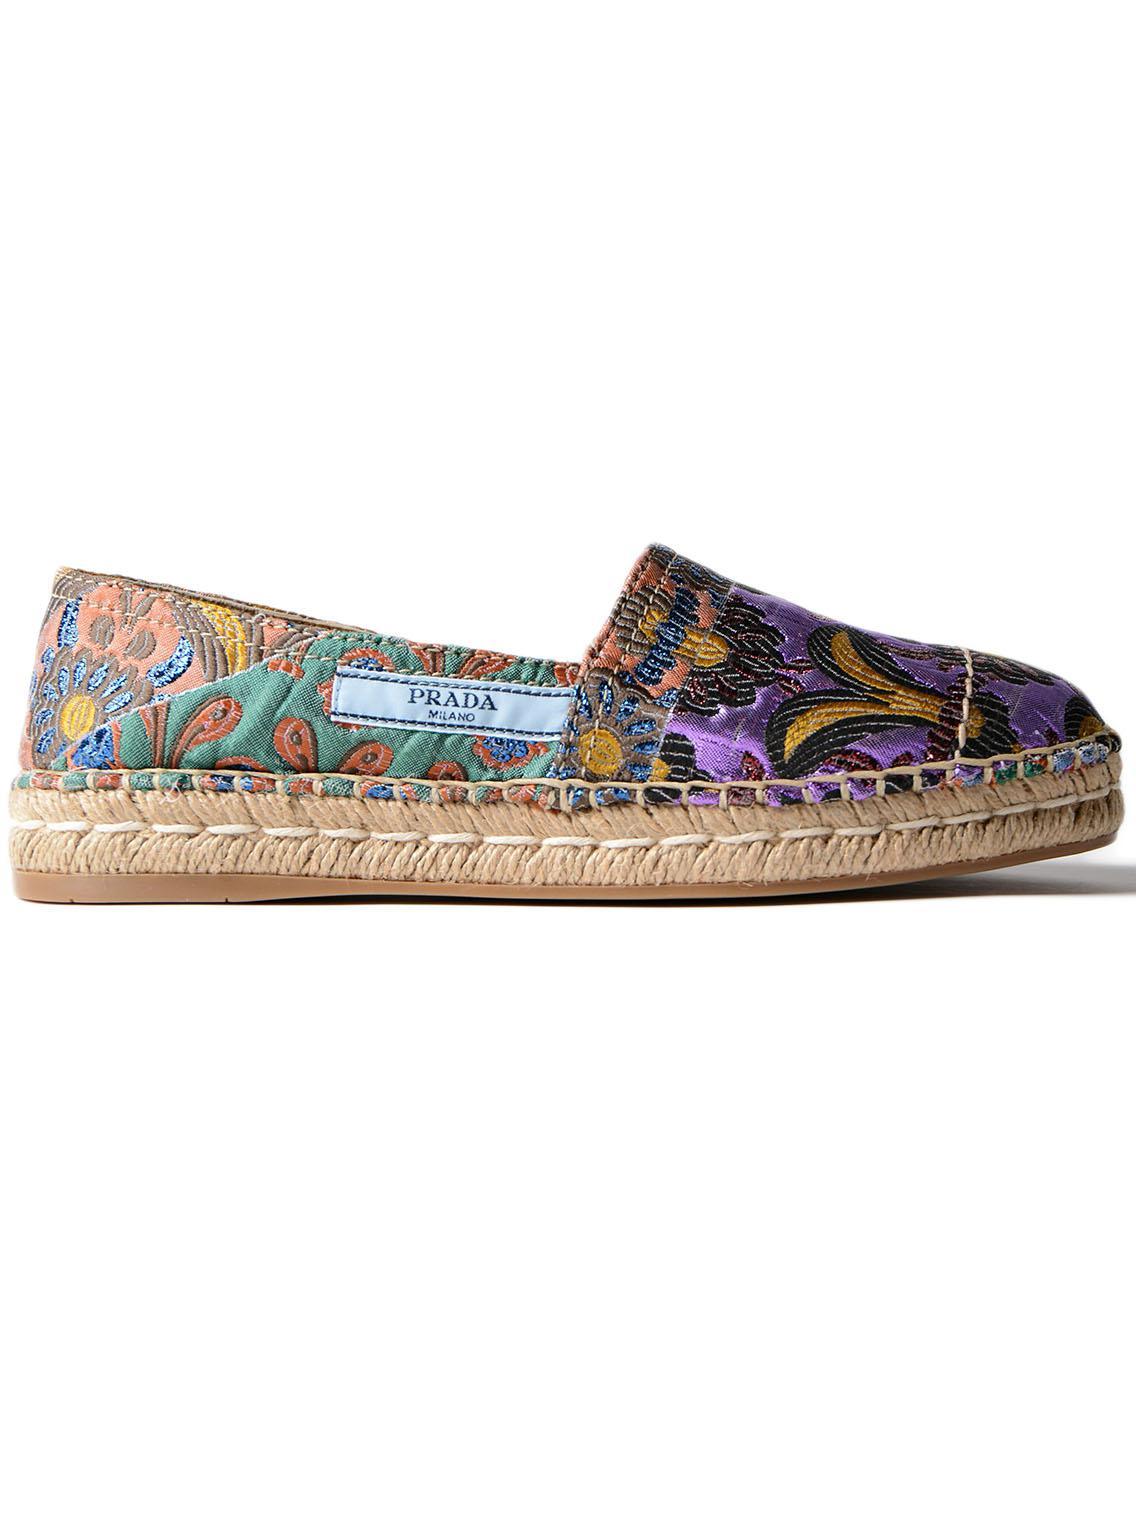 570f8cf31b163 Prada - Multicolor Lurex Patch Slippers - Lyst